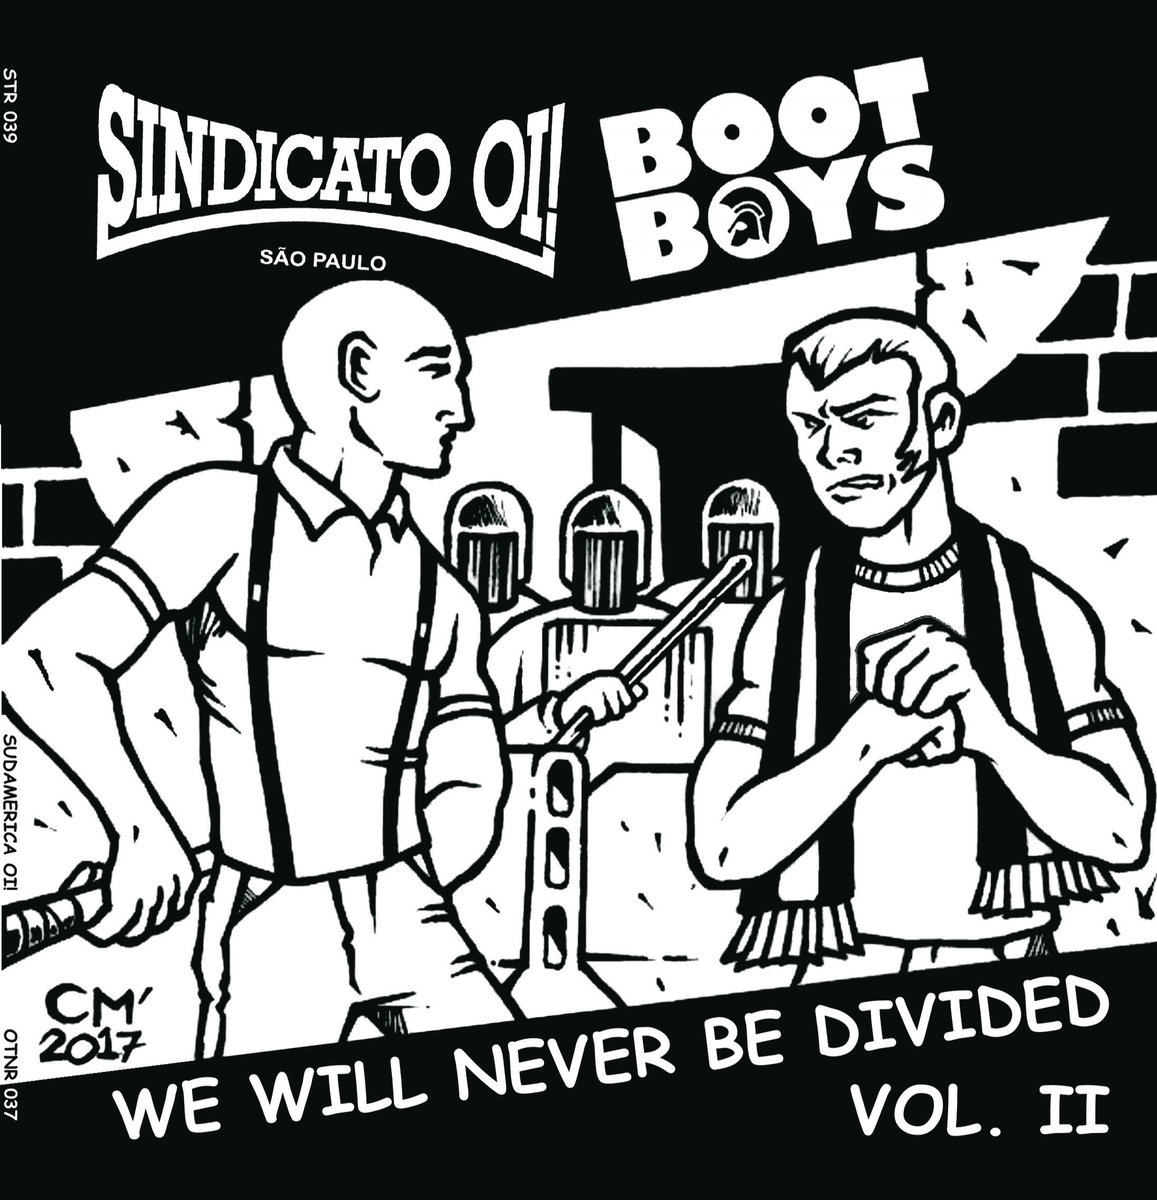 Bootboys.